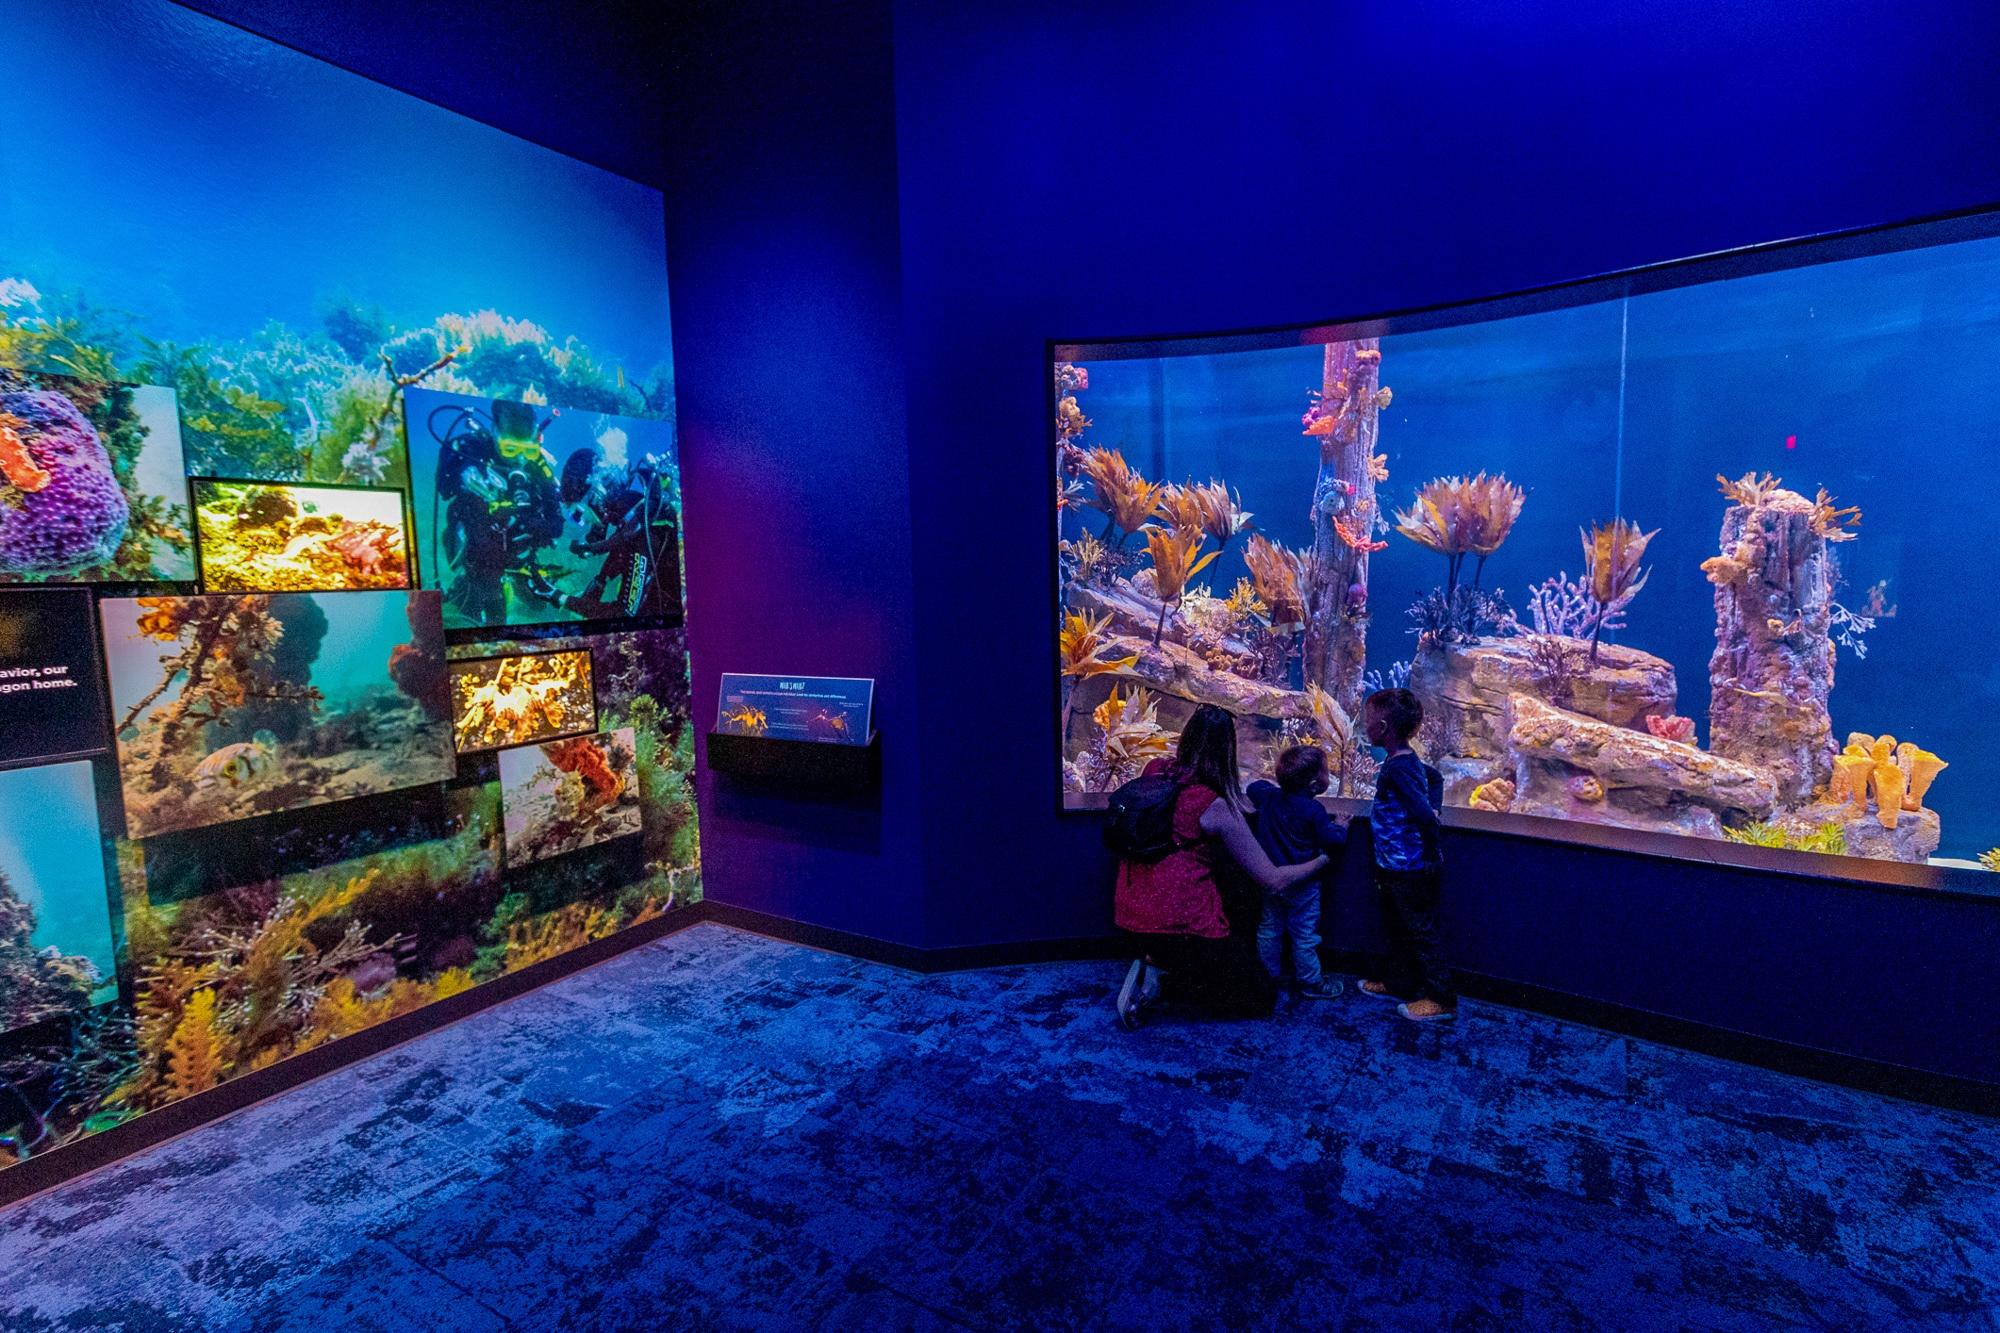 Seadragons & Seahorses exhibit